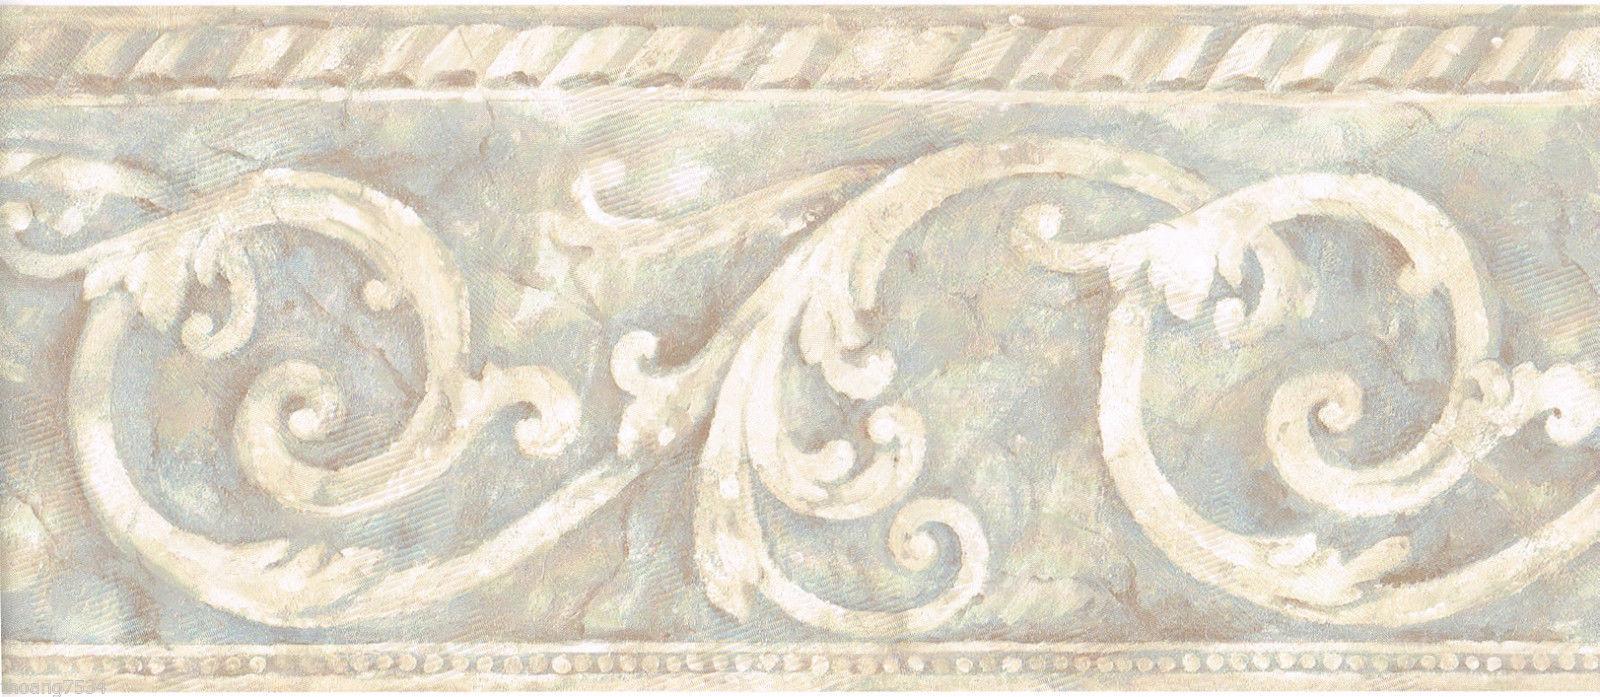 Acanthus Leaf Venetian Scroll Beige Blue Grey Wall paper Border 1600x697